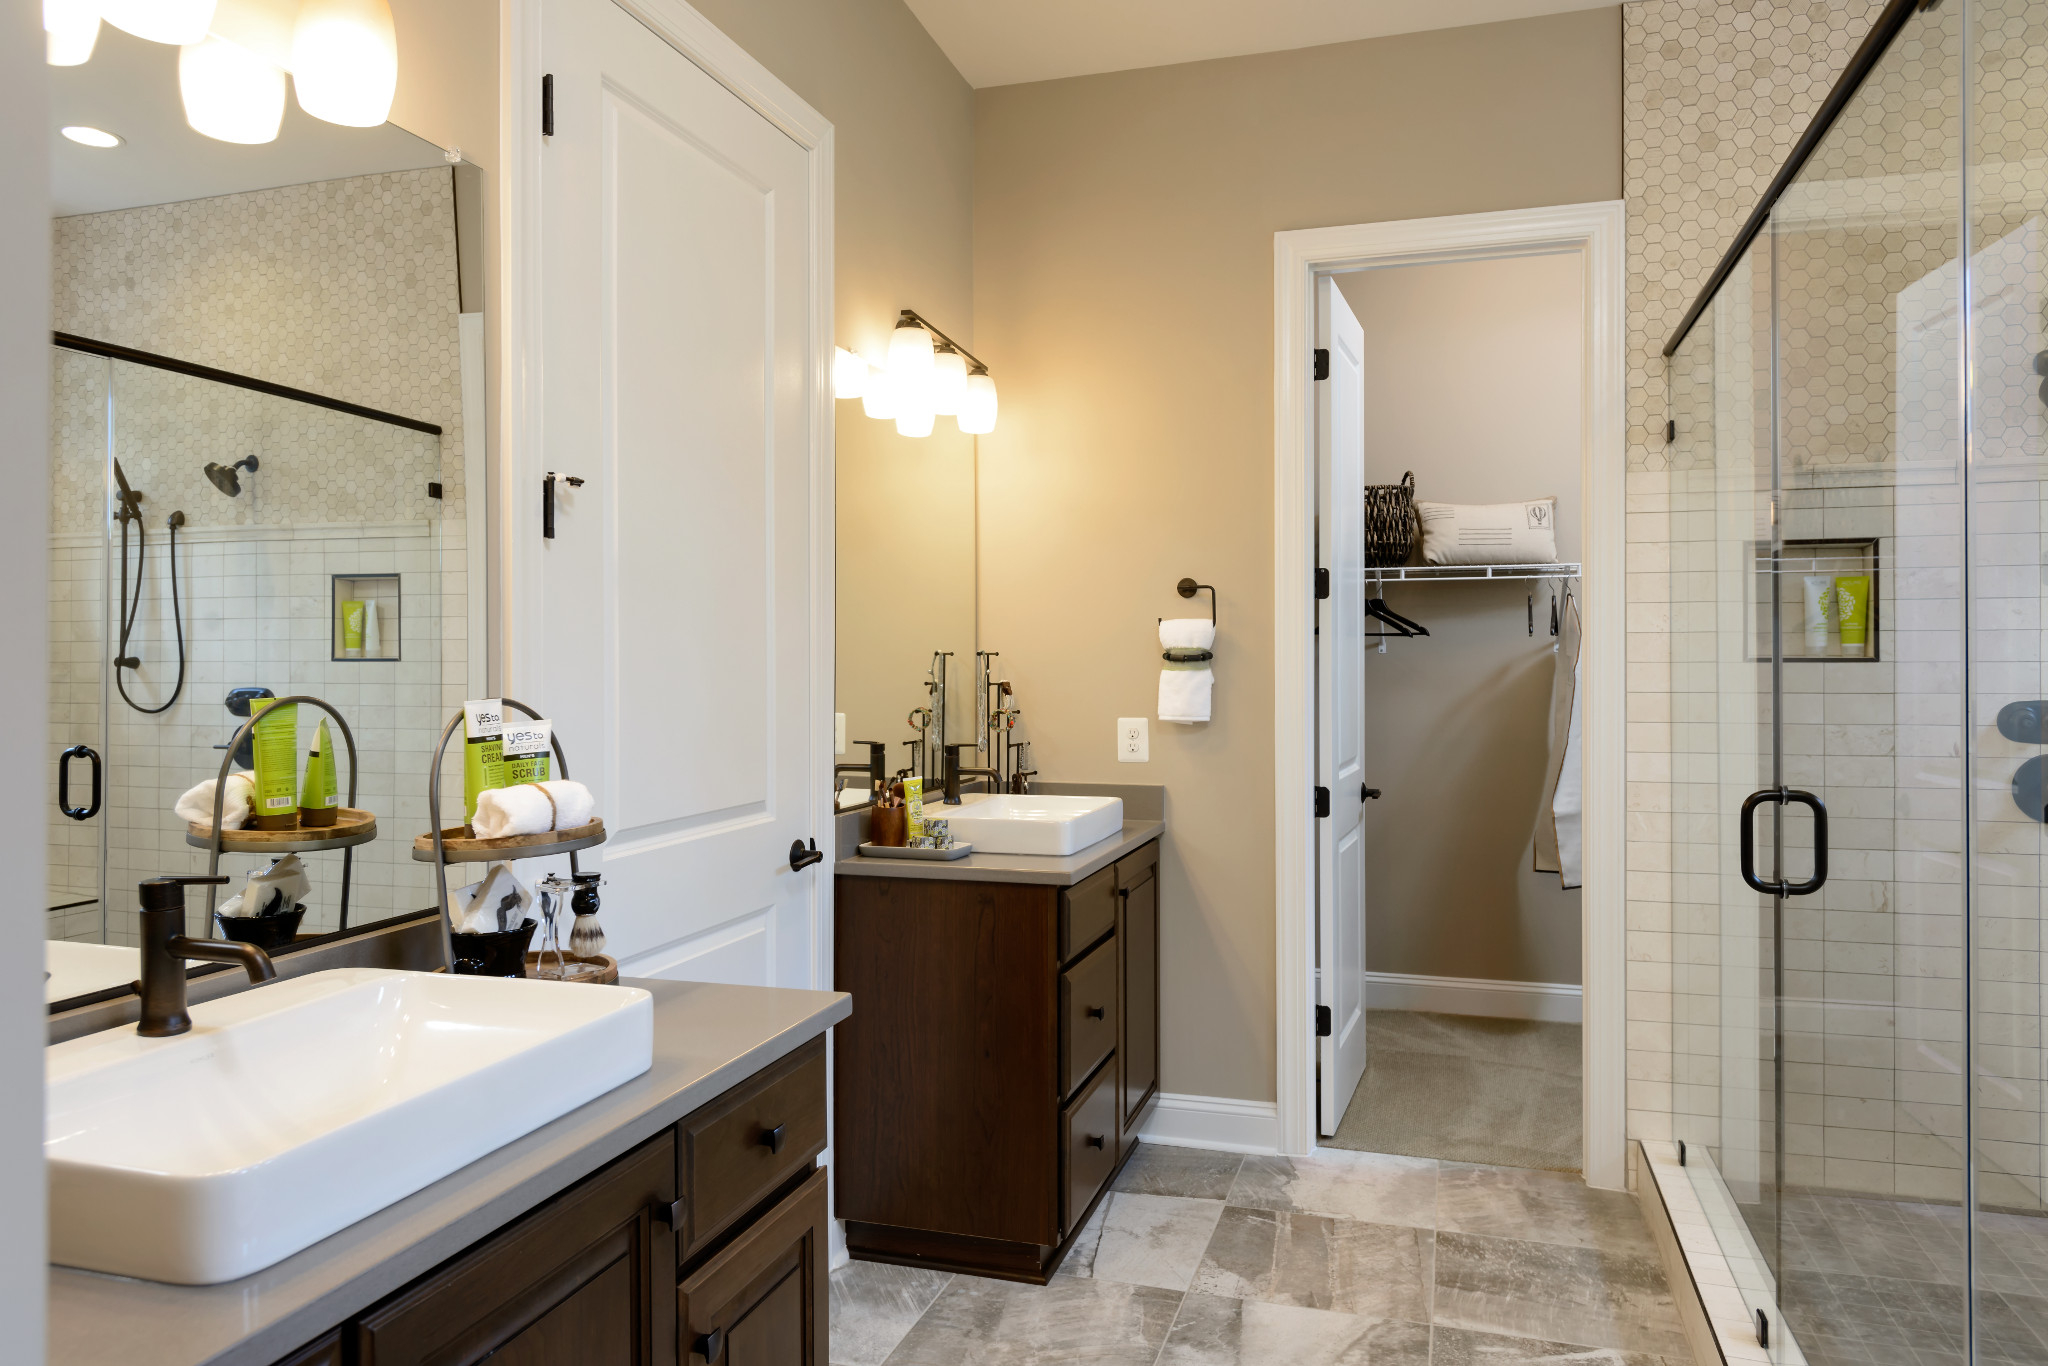 Evoke Plan Owner's Bath